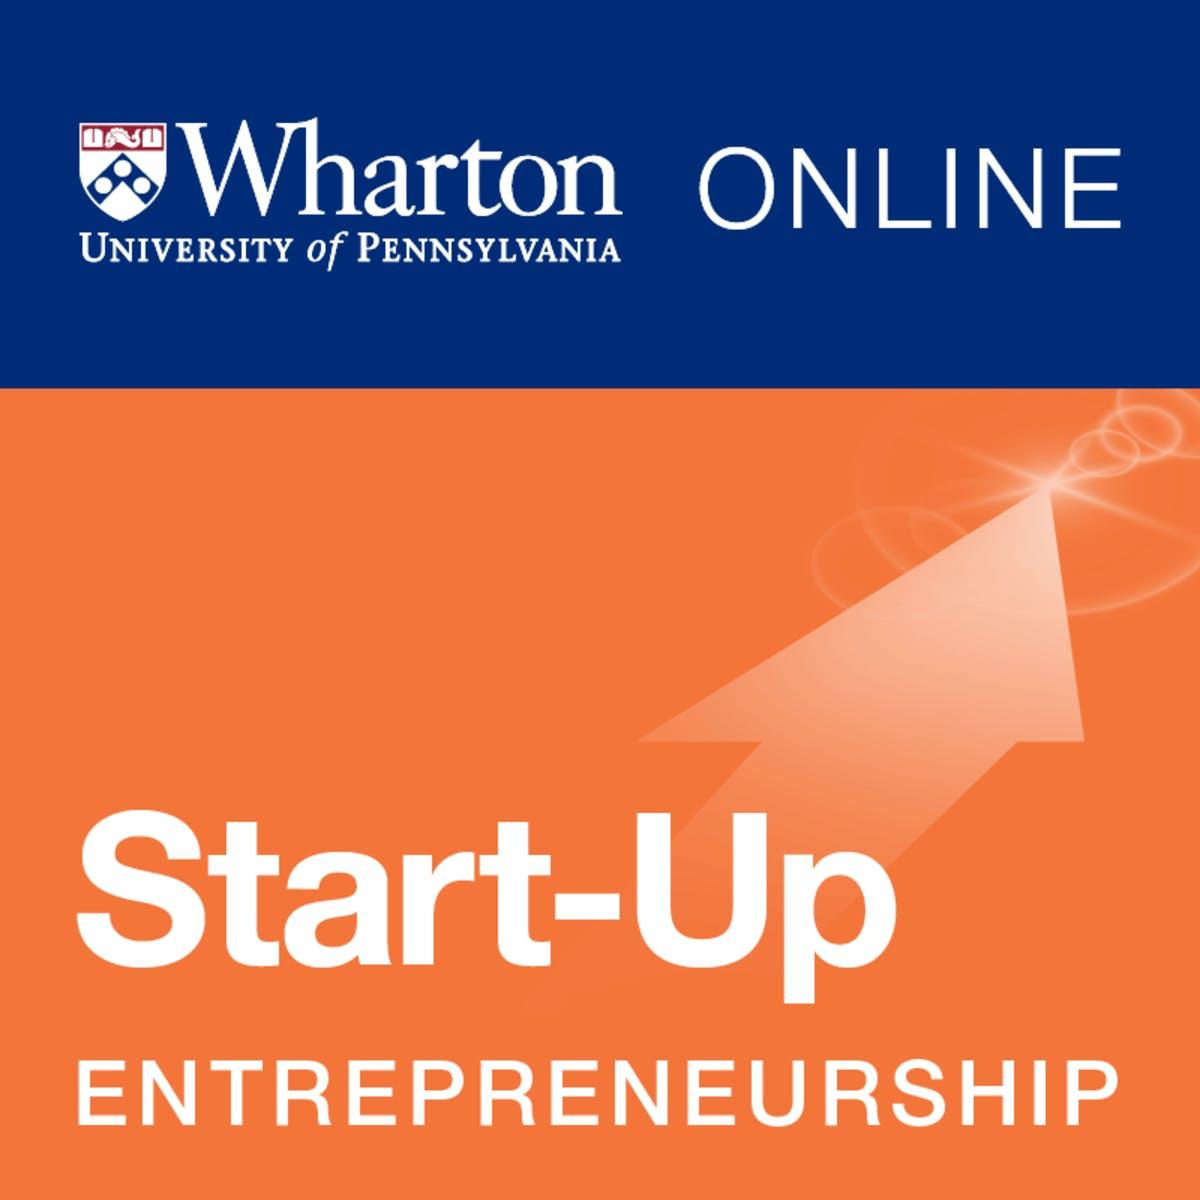 Entrepreneurship 2: Launching your Start-Up